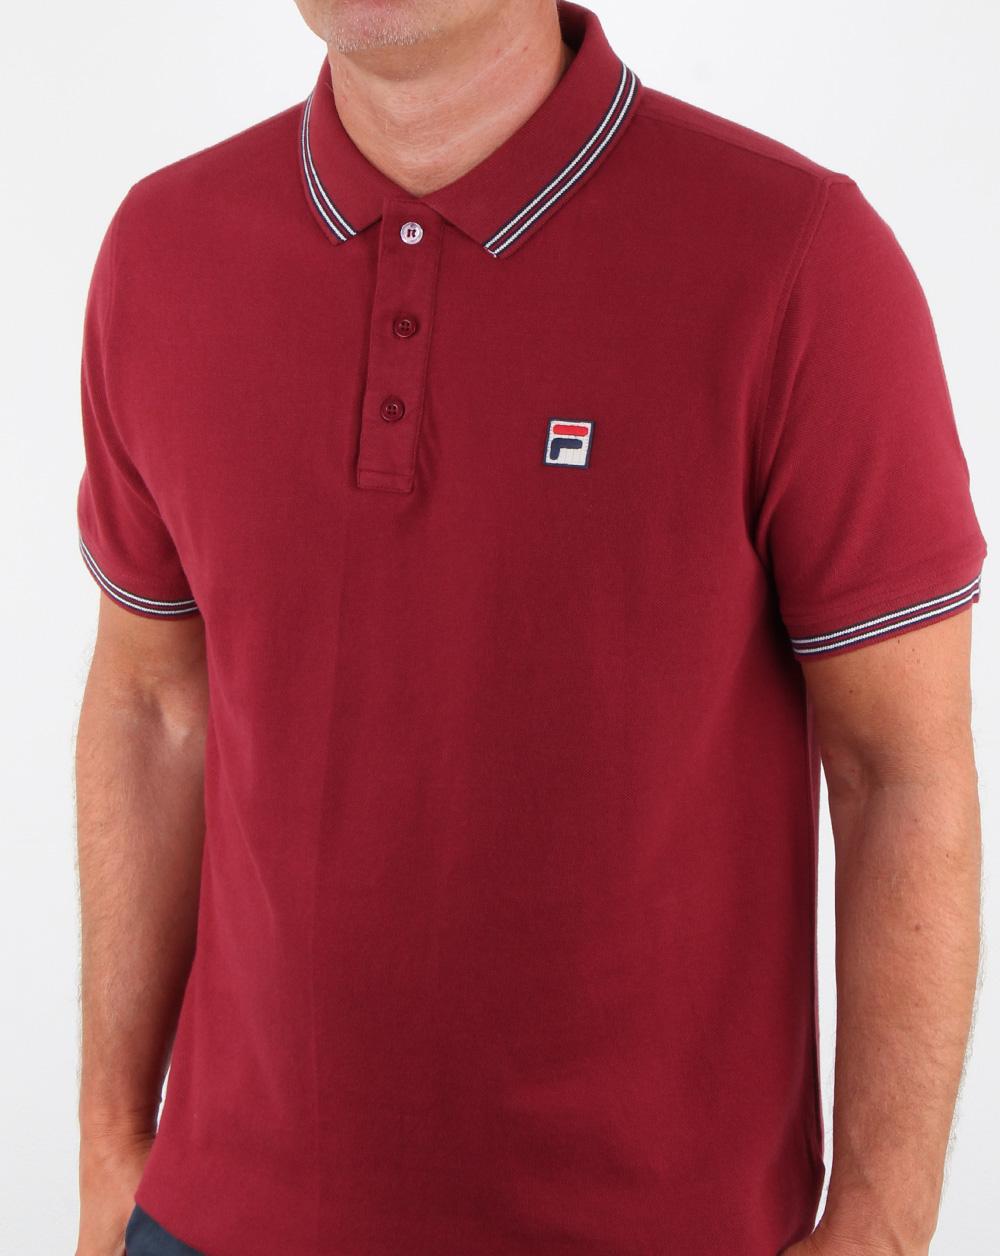 Fila Vintage Matcho 4 Polo Shirt Tibetan Red